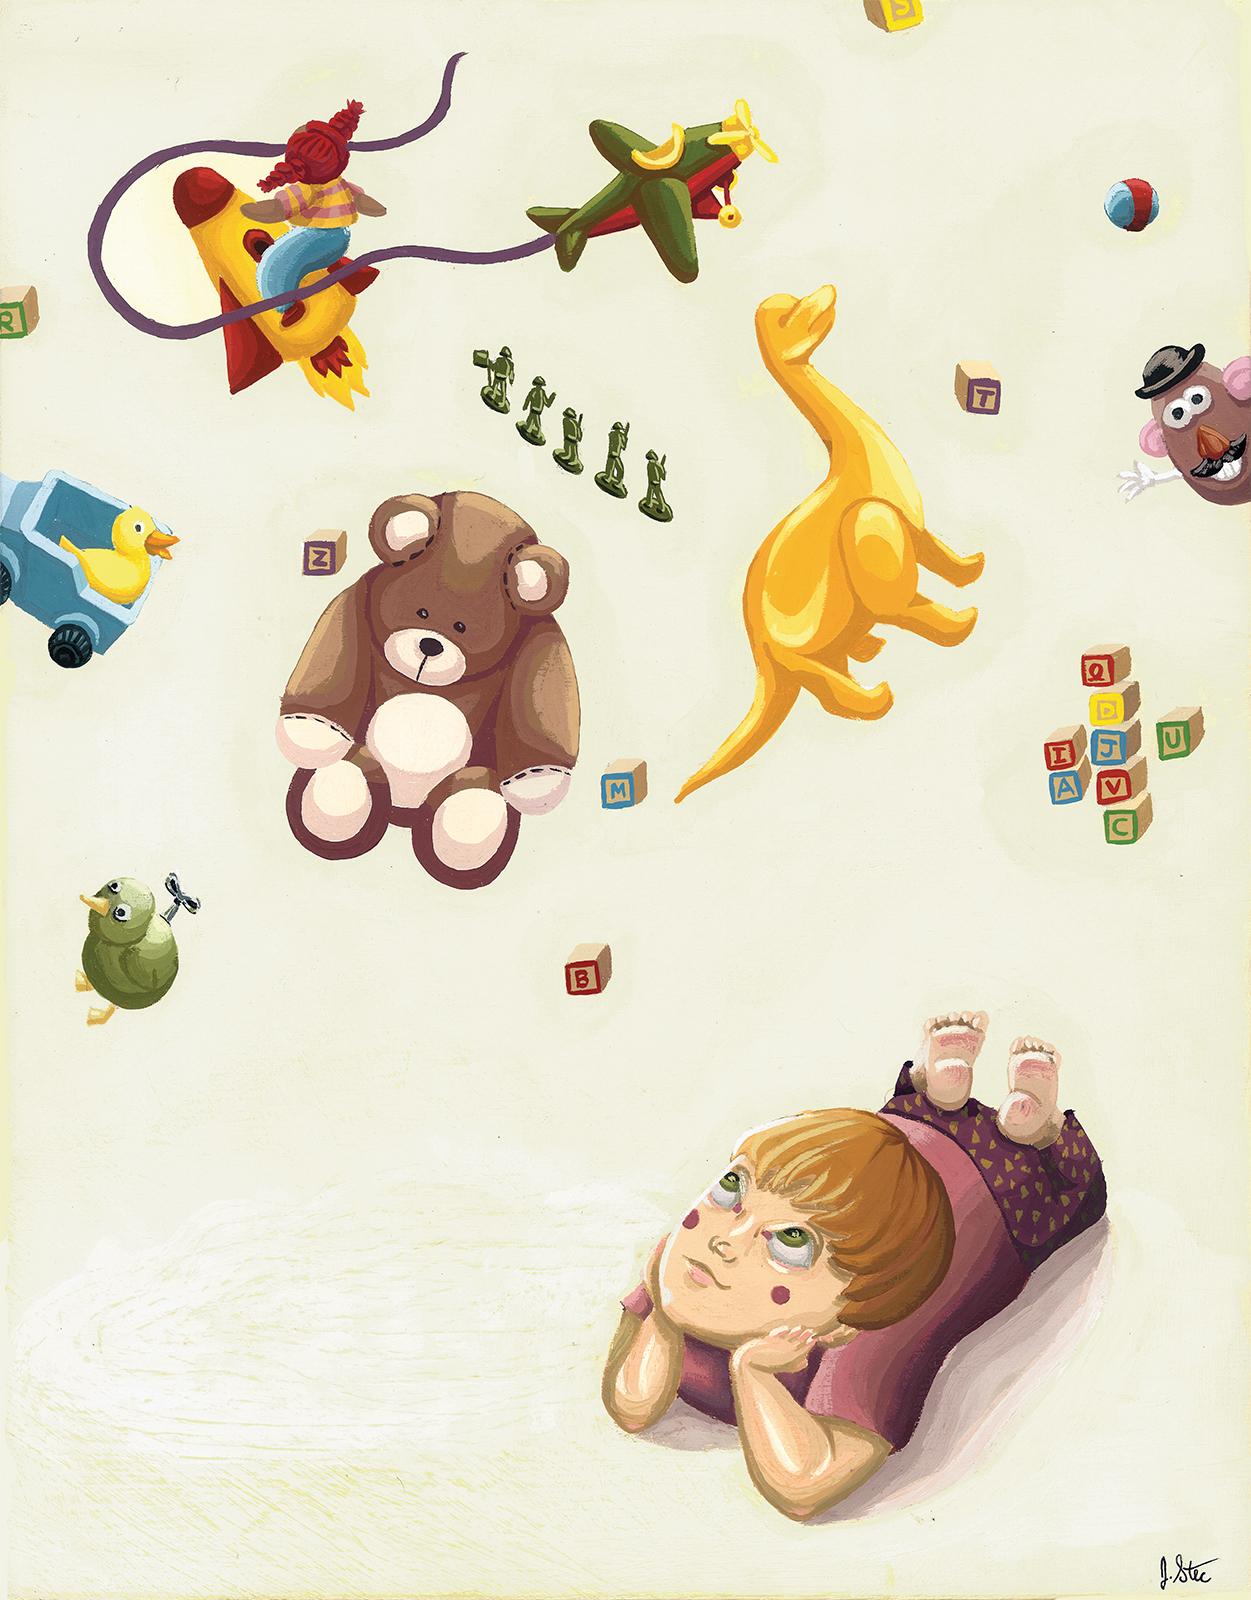 Illustration by Jessica Stec